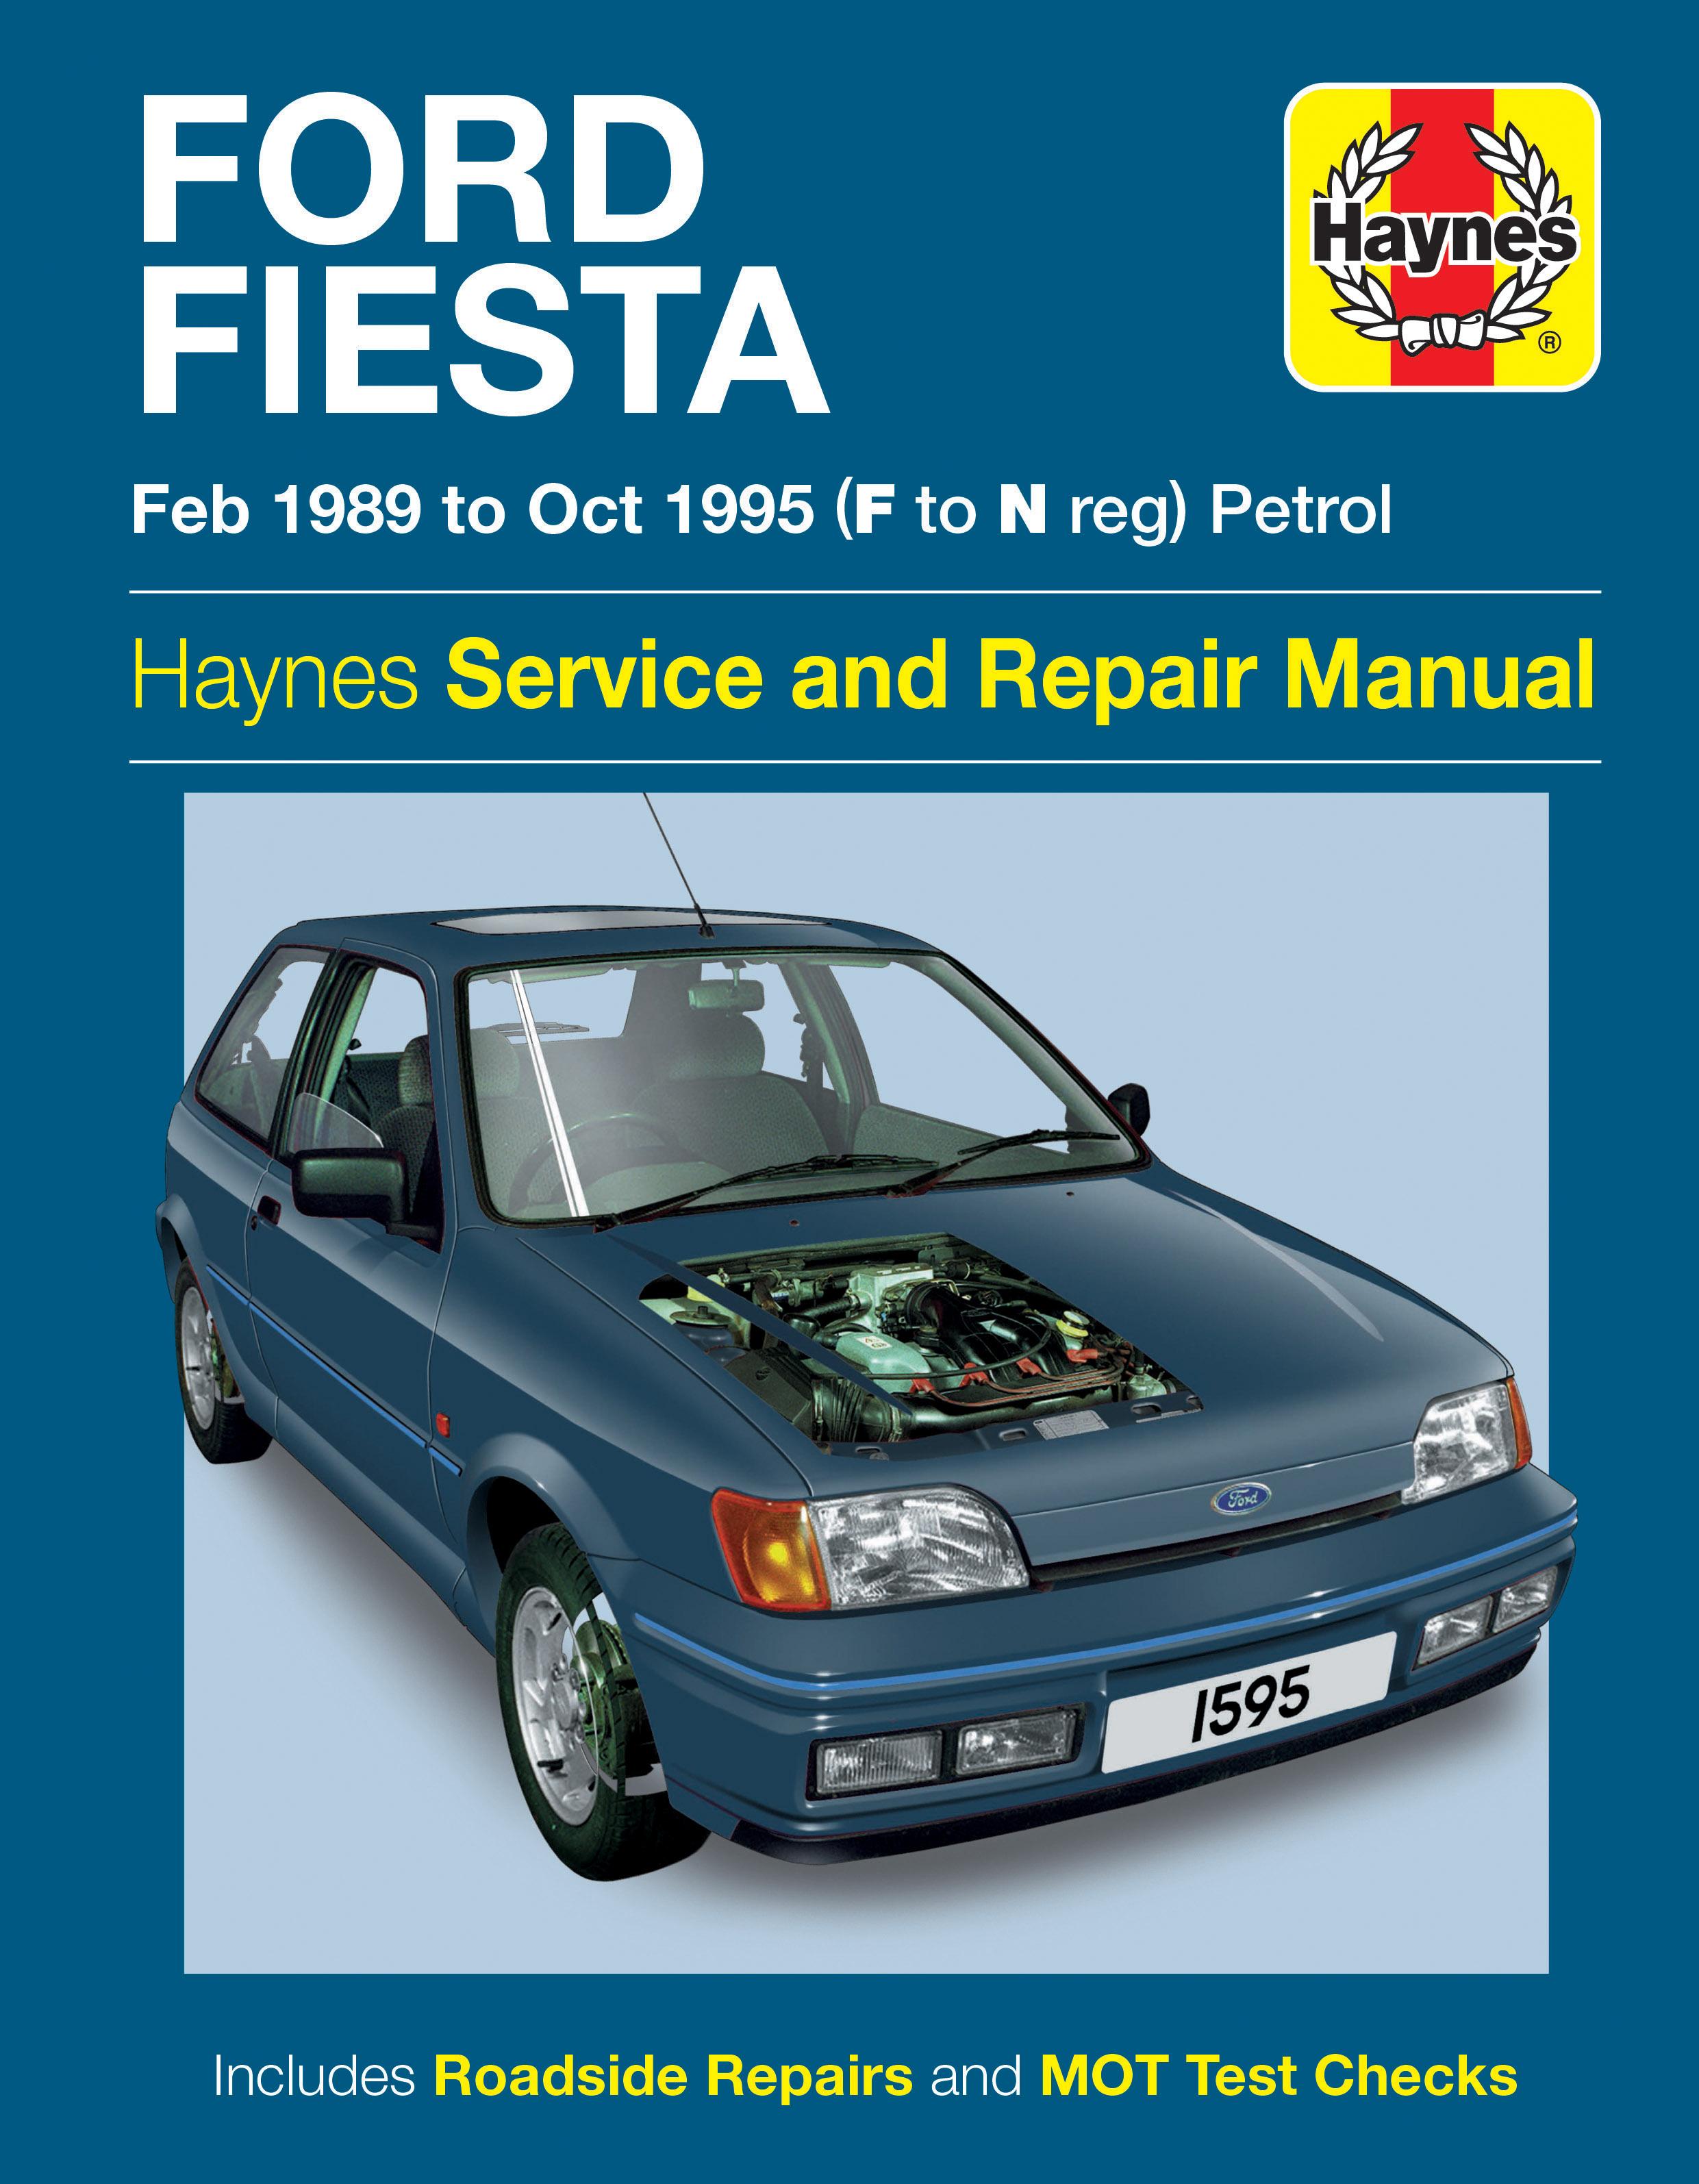 Ford Fiesta Petrol Feb 89 Oct 95 Haynes Repair Manual border=